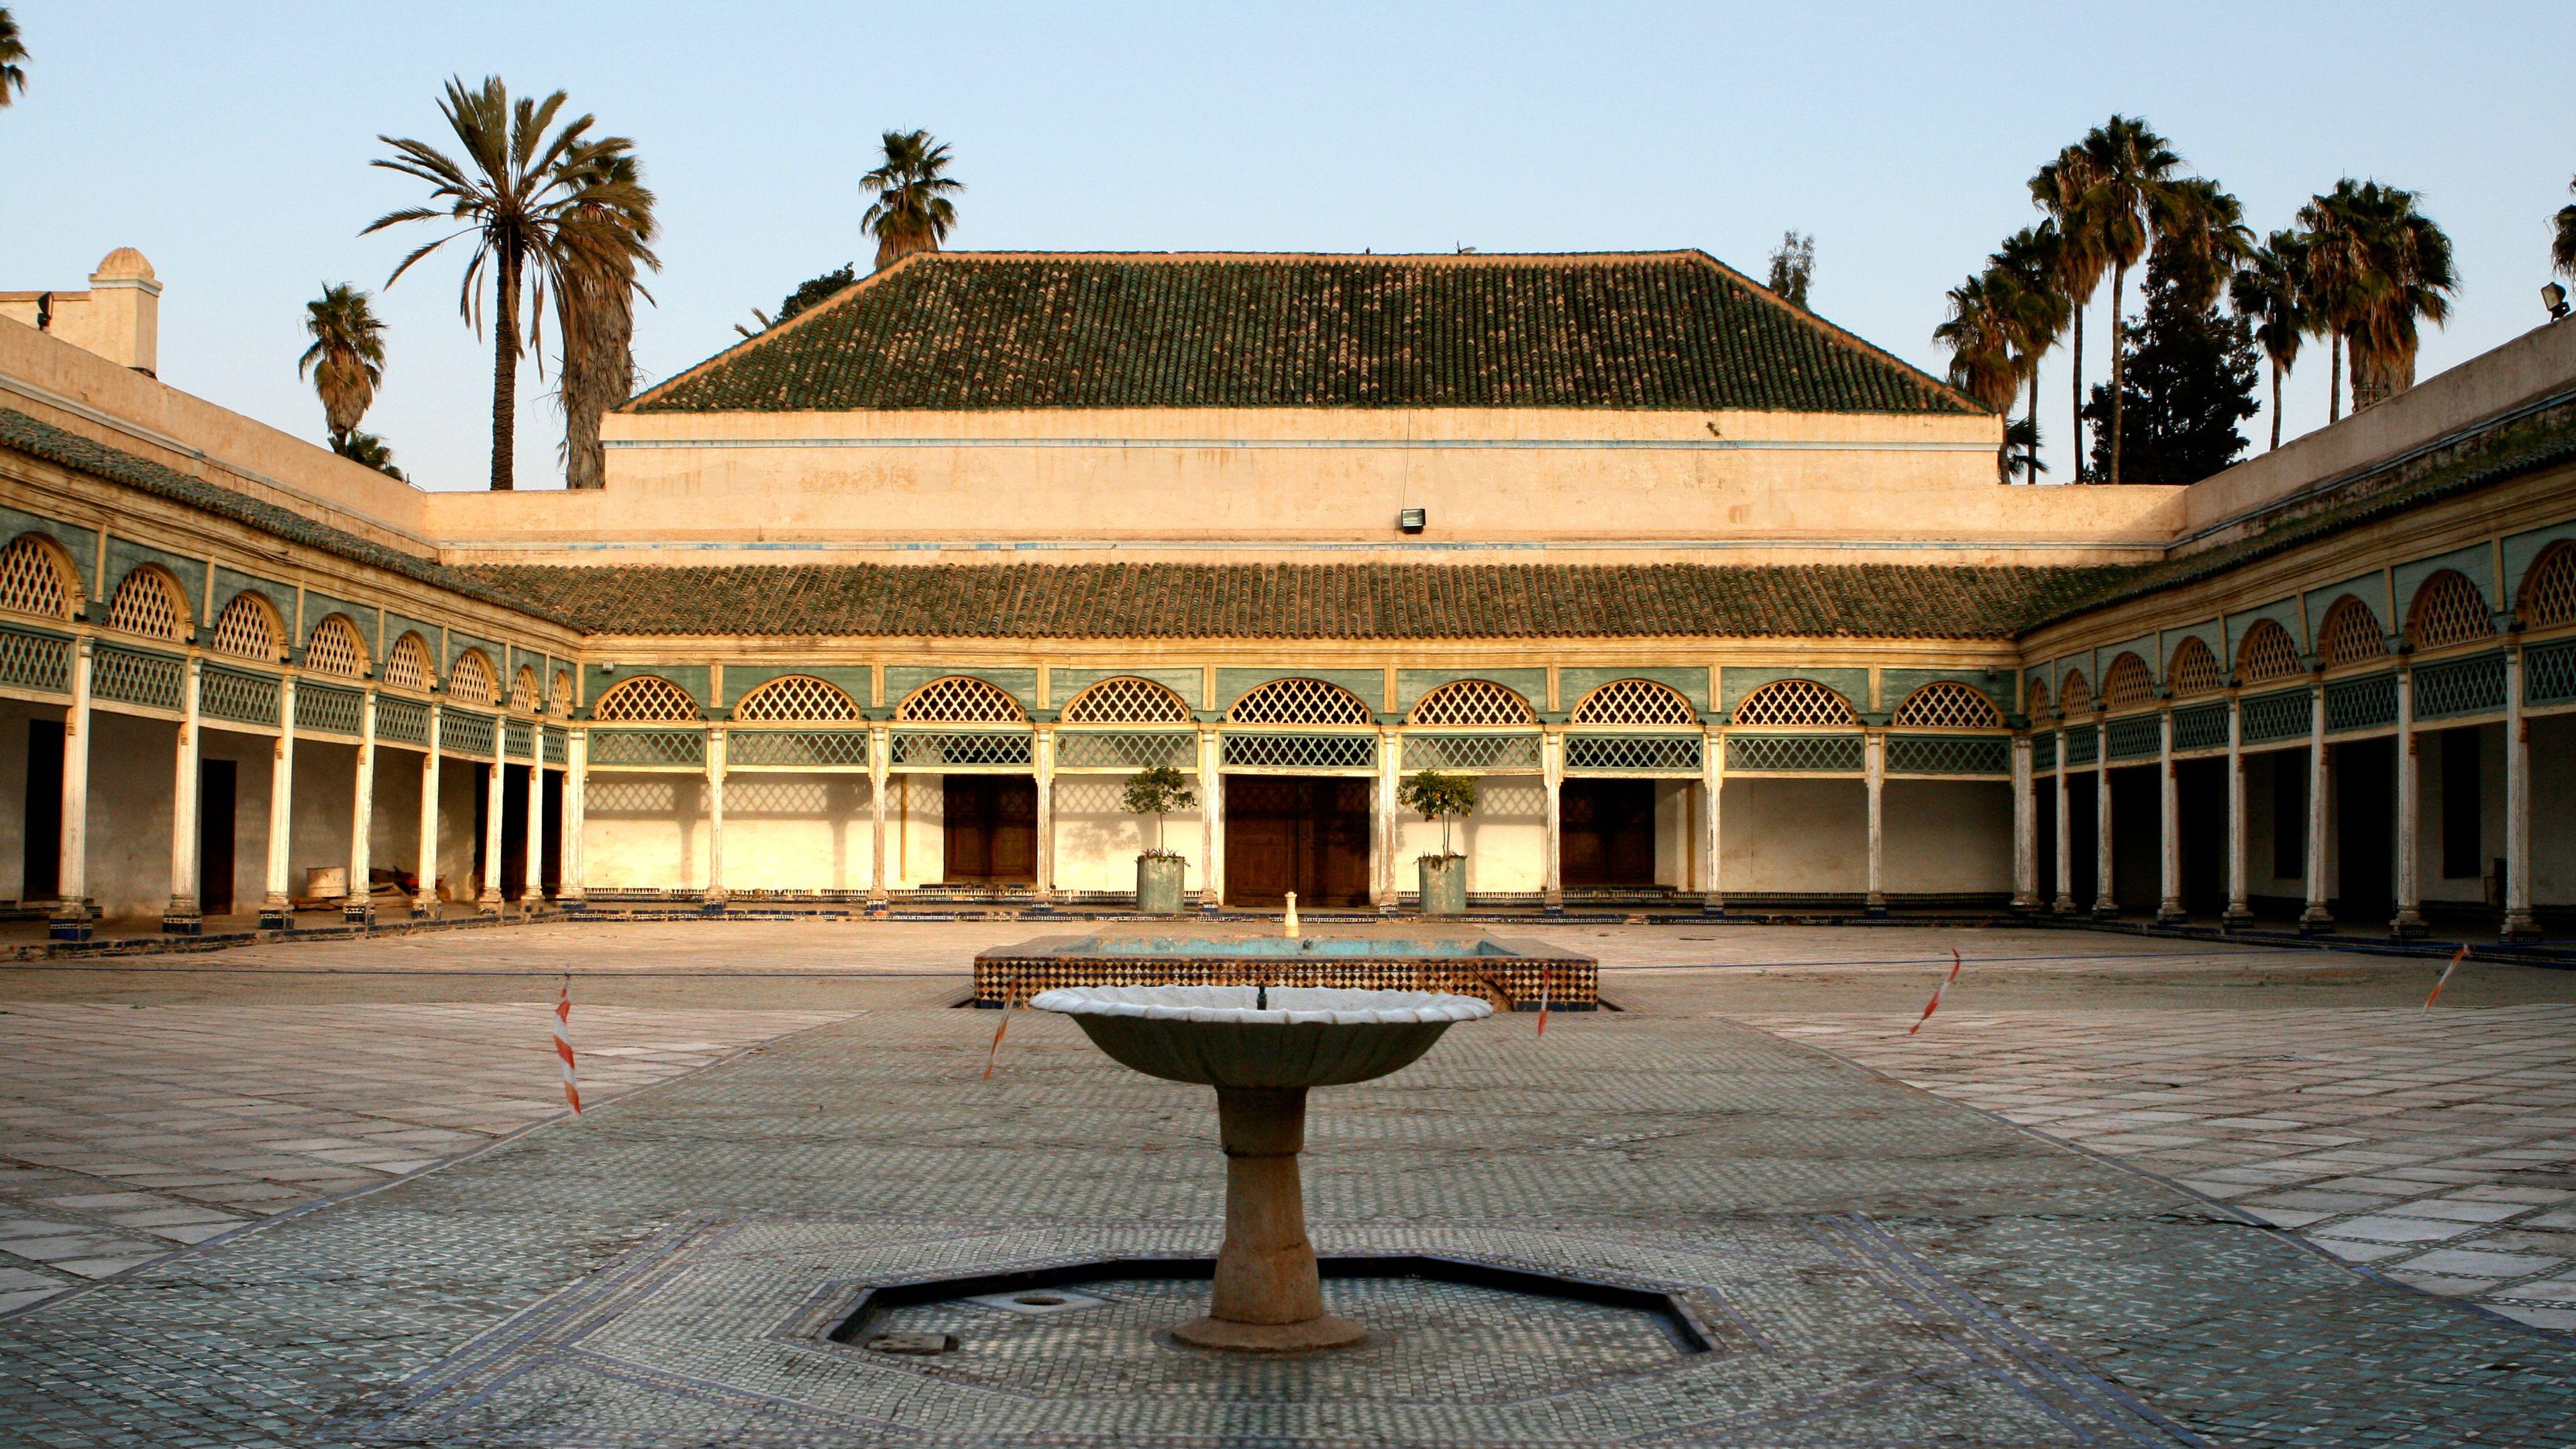 Full-Day Marrakesh Tour from Casablanca